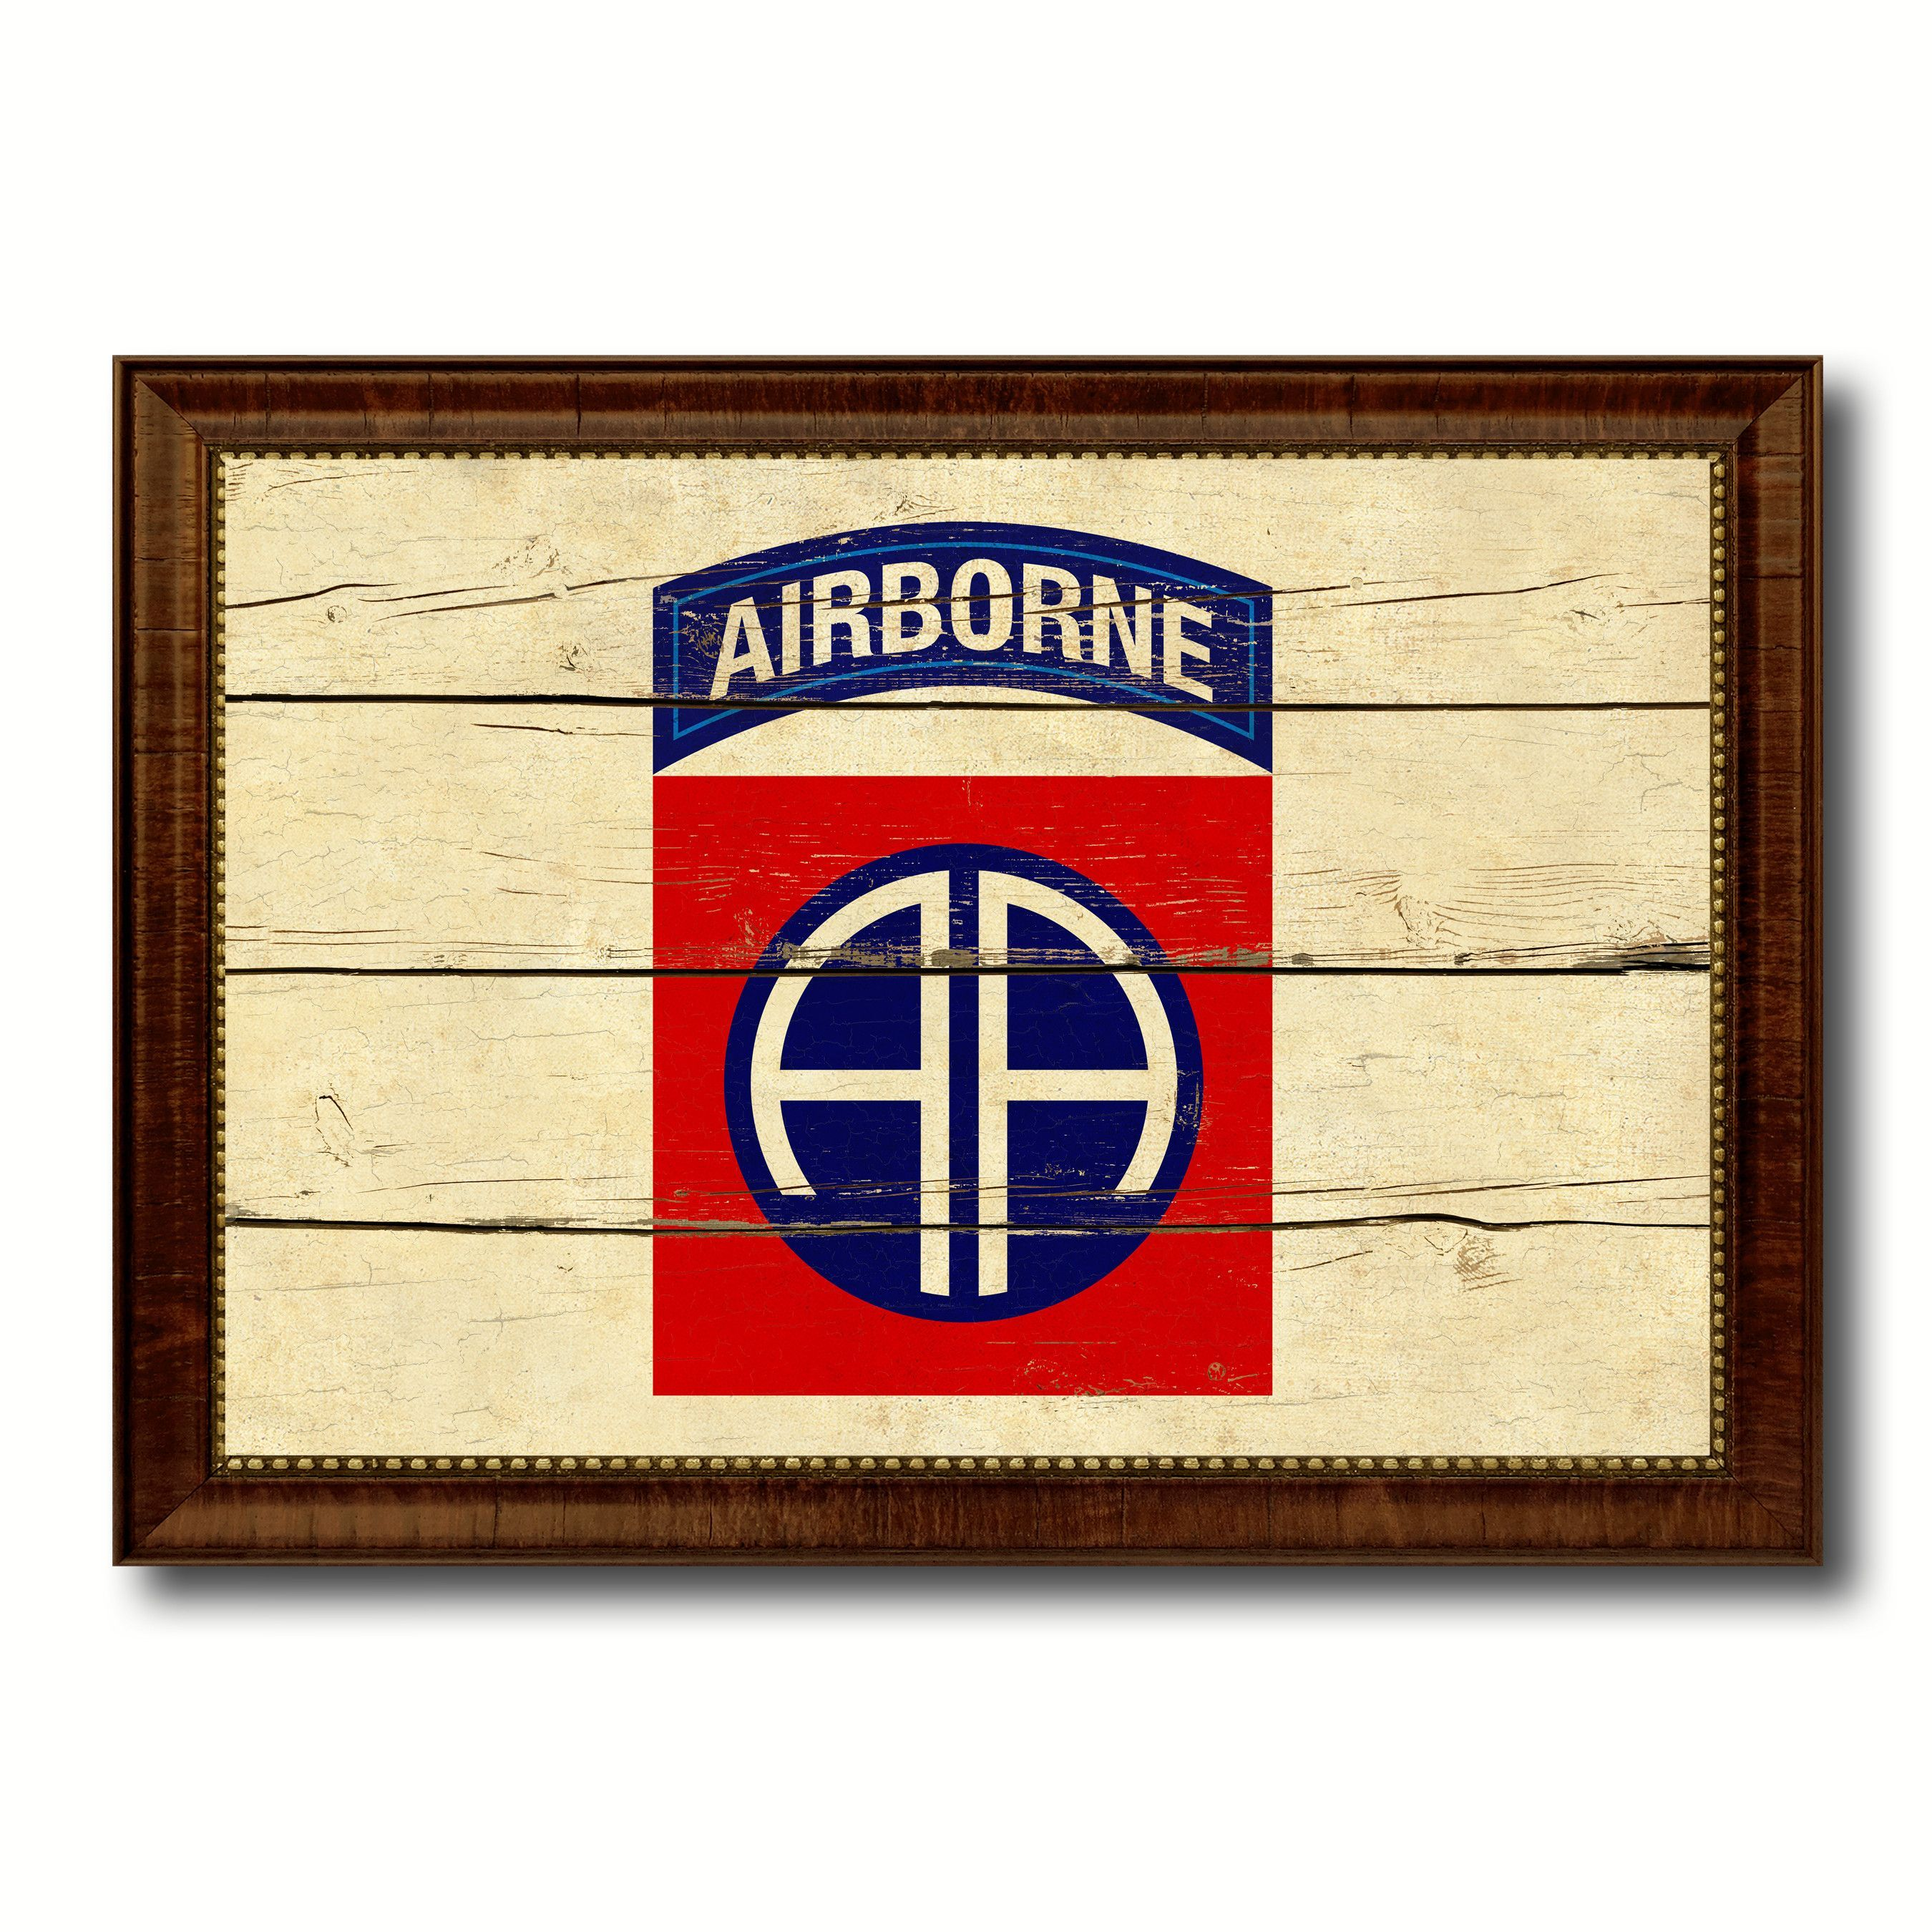 Us army 82nd airborne military flag vintage canvas print with us army 82nd airborne military flag vintage canvas print with brown picture frame gifts ideas home jeuxipadfo Images